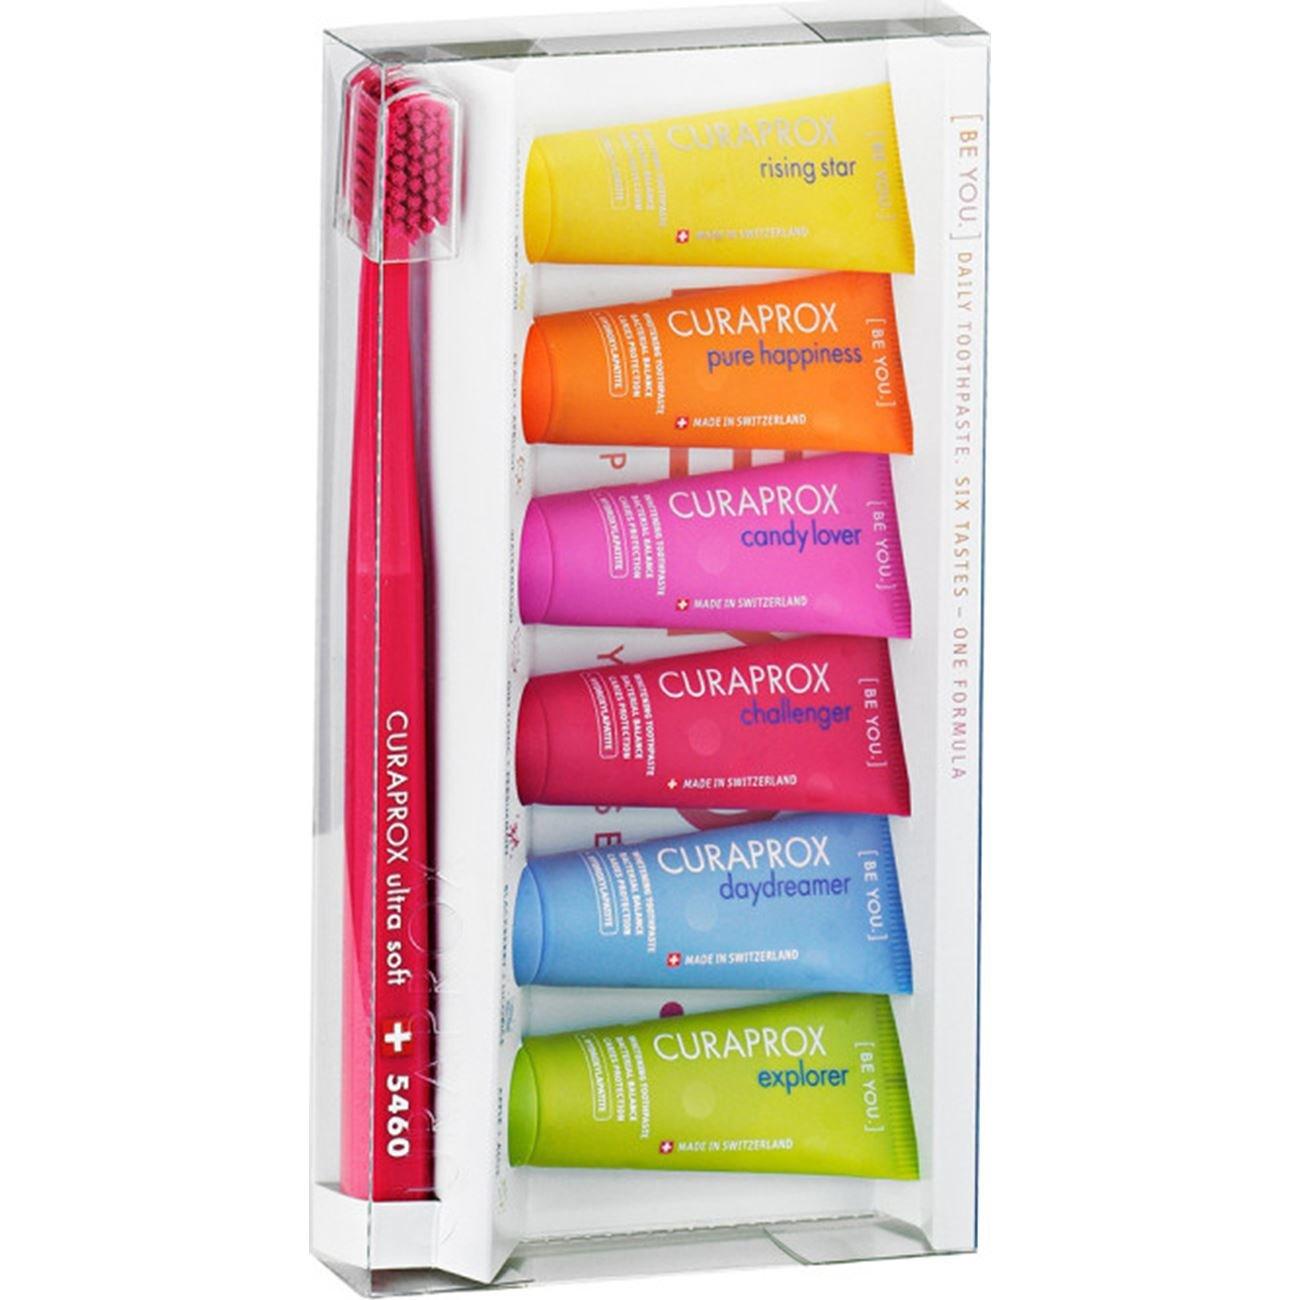 Curaprox Πακέτο Προσφοράς Be You Six Tastes Mini Pack 6x10ml & Δώρο Οδοντόβουρτσα CS5460 (Μίνι Συσκευασία σε 6 Υπέροχες Γεύσεις)